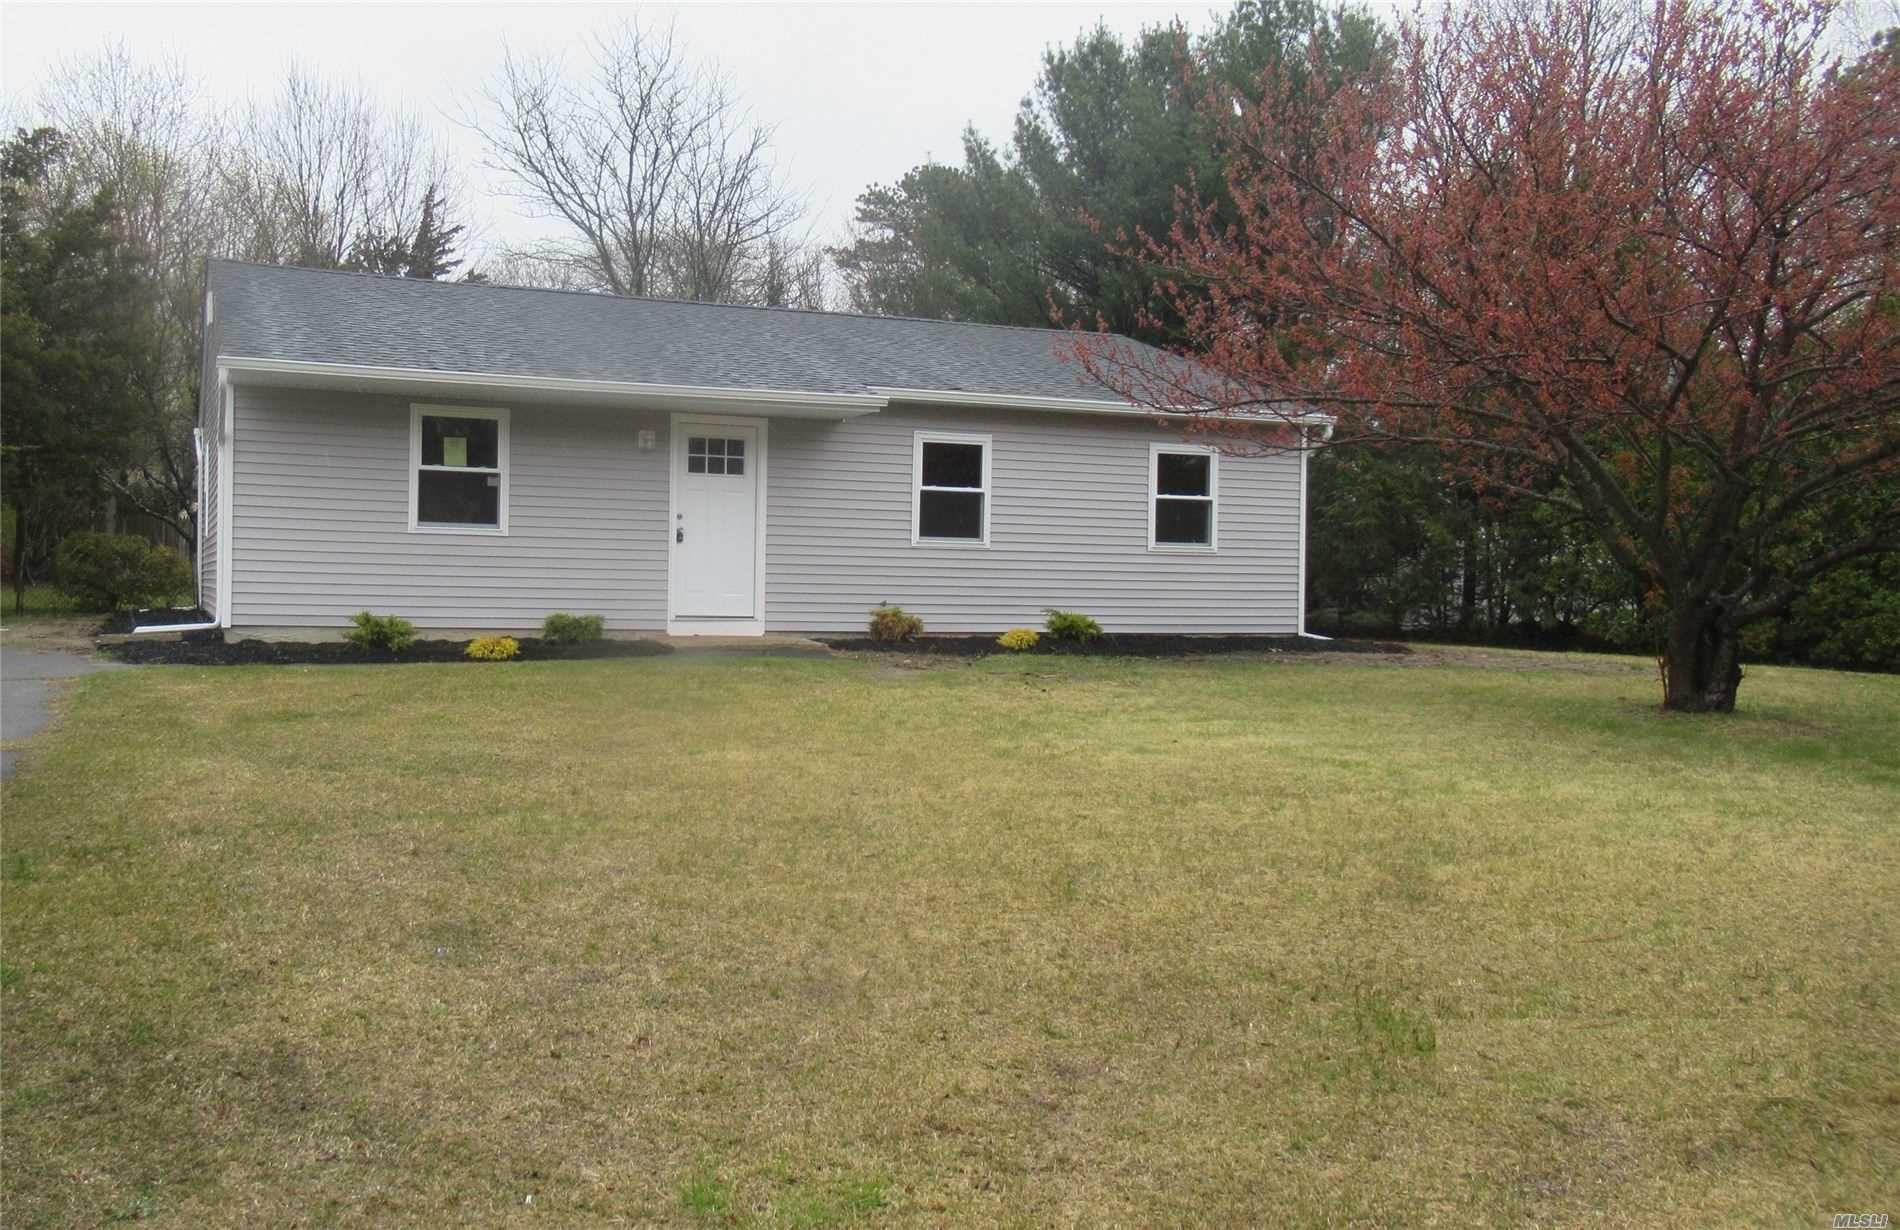 139 Pine Road, Coram, NY 11727 - MLS#: 3205950